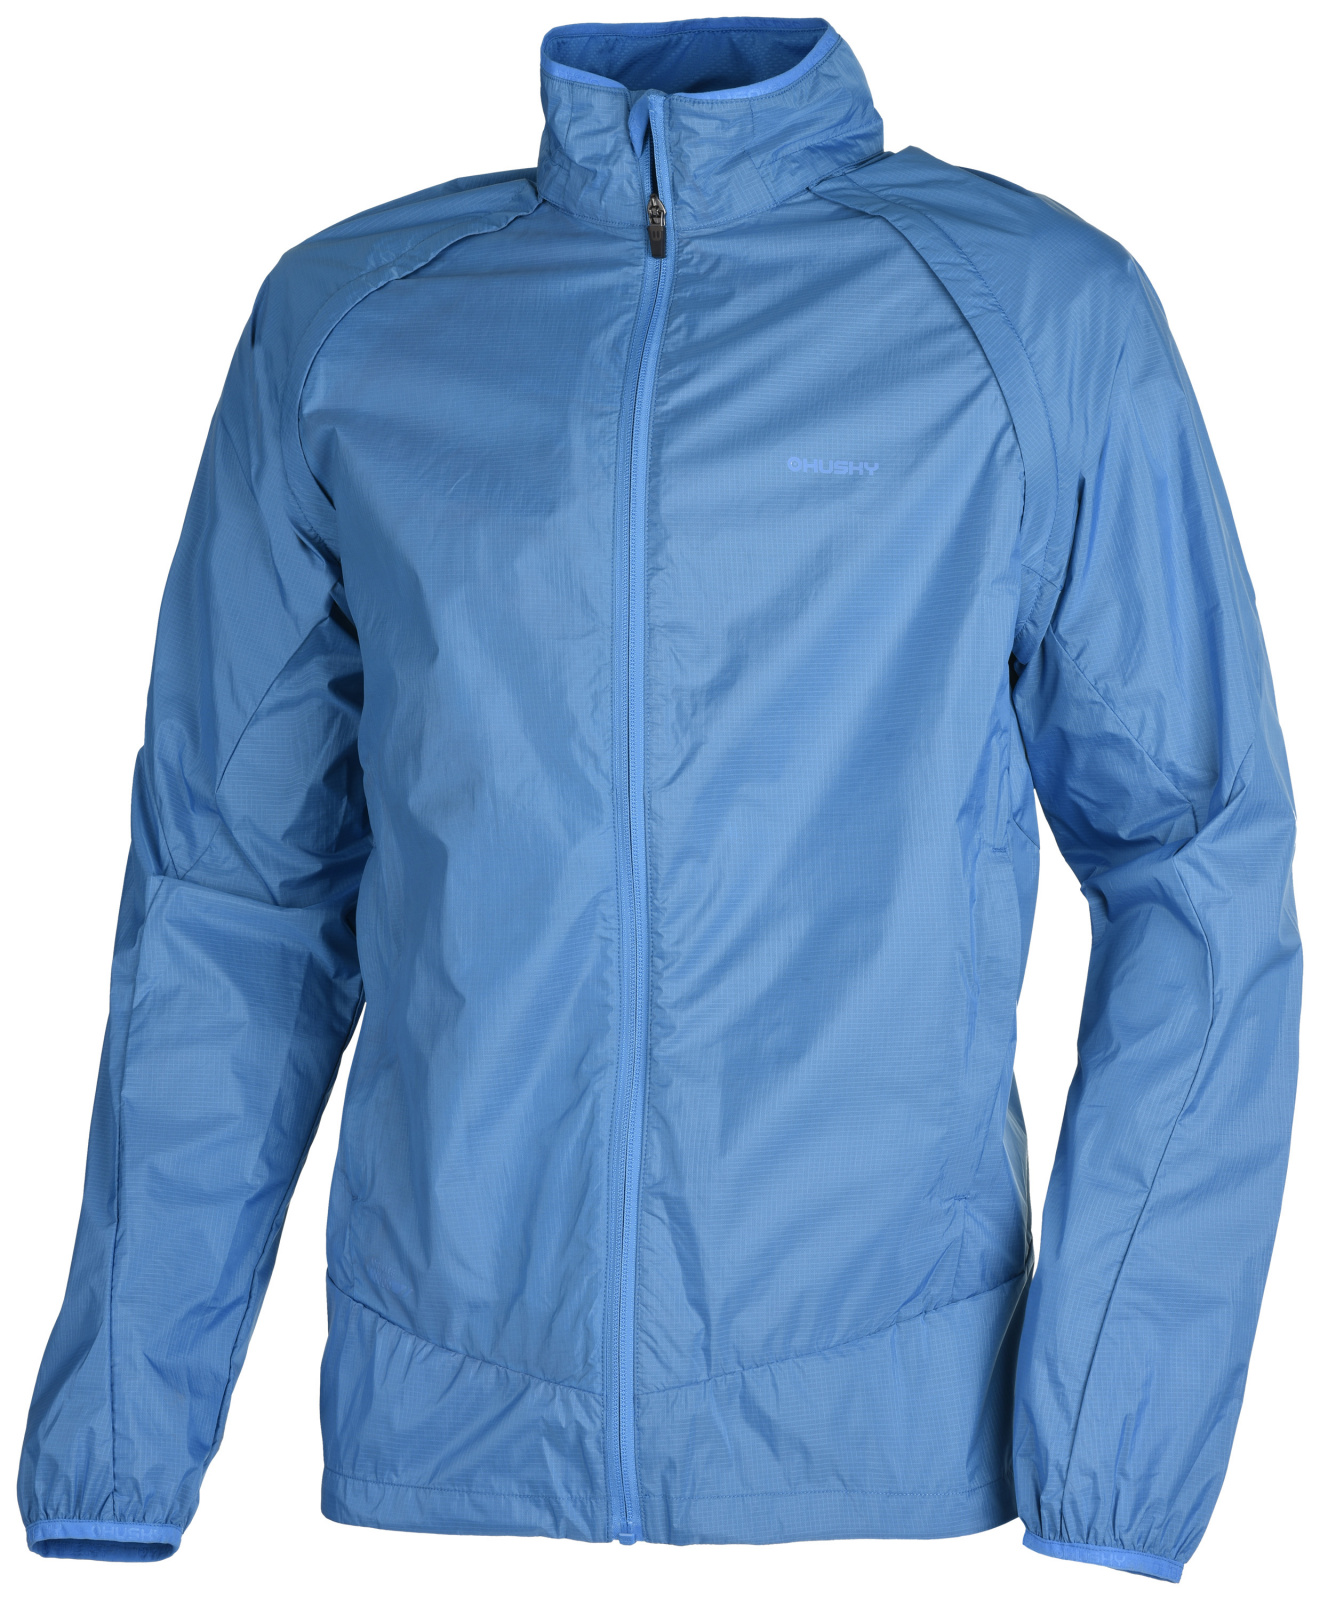 Husky Pánská outdoor bunda Nolen M modrá Velikost: M